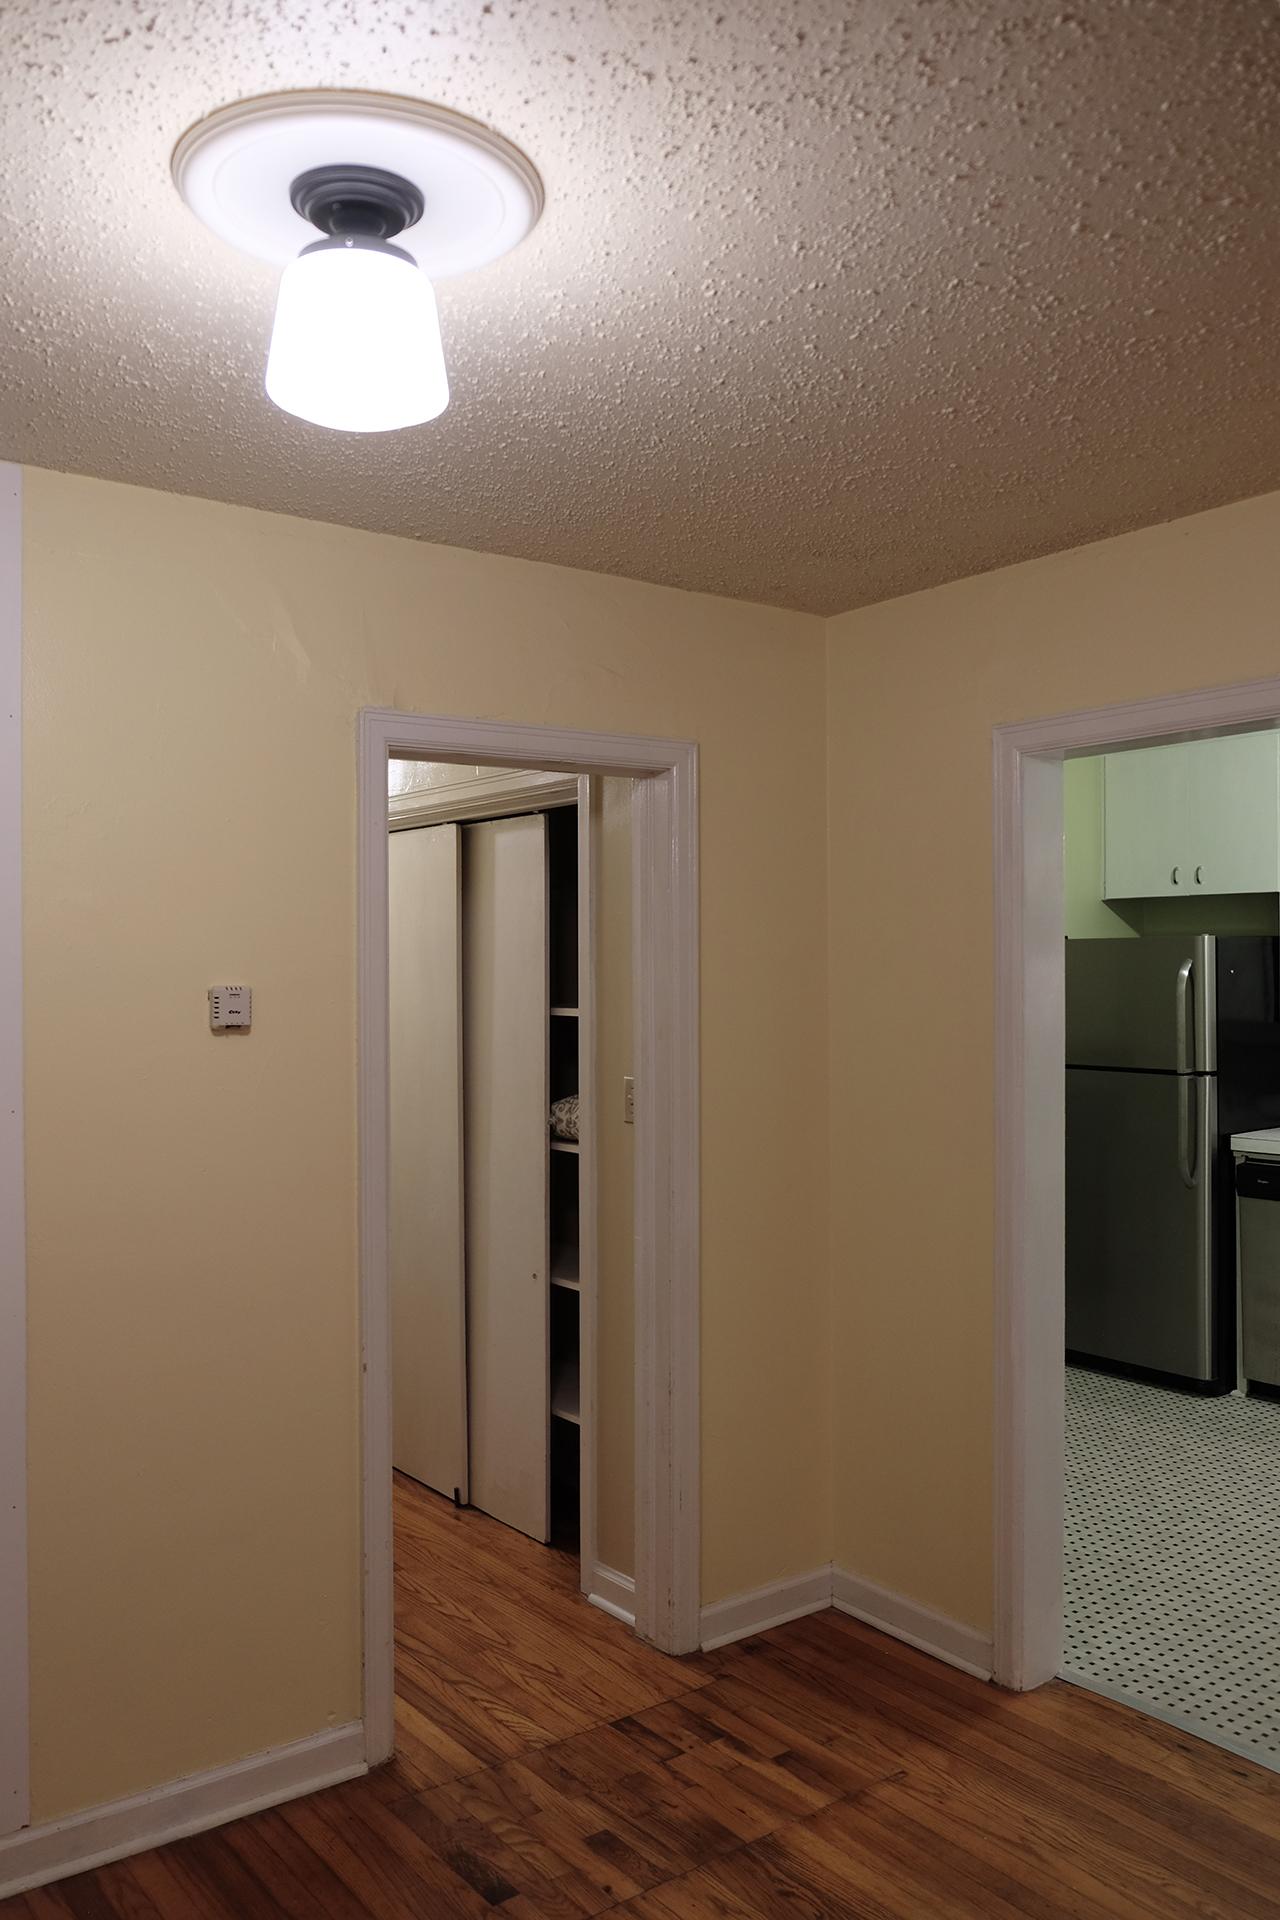 East living room (looking northwest) - 102 South Kings Rent House